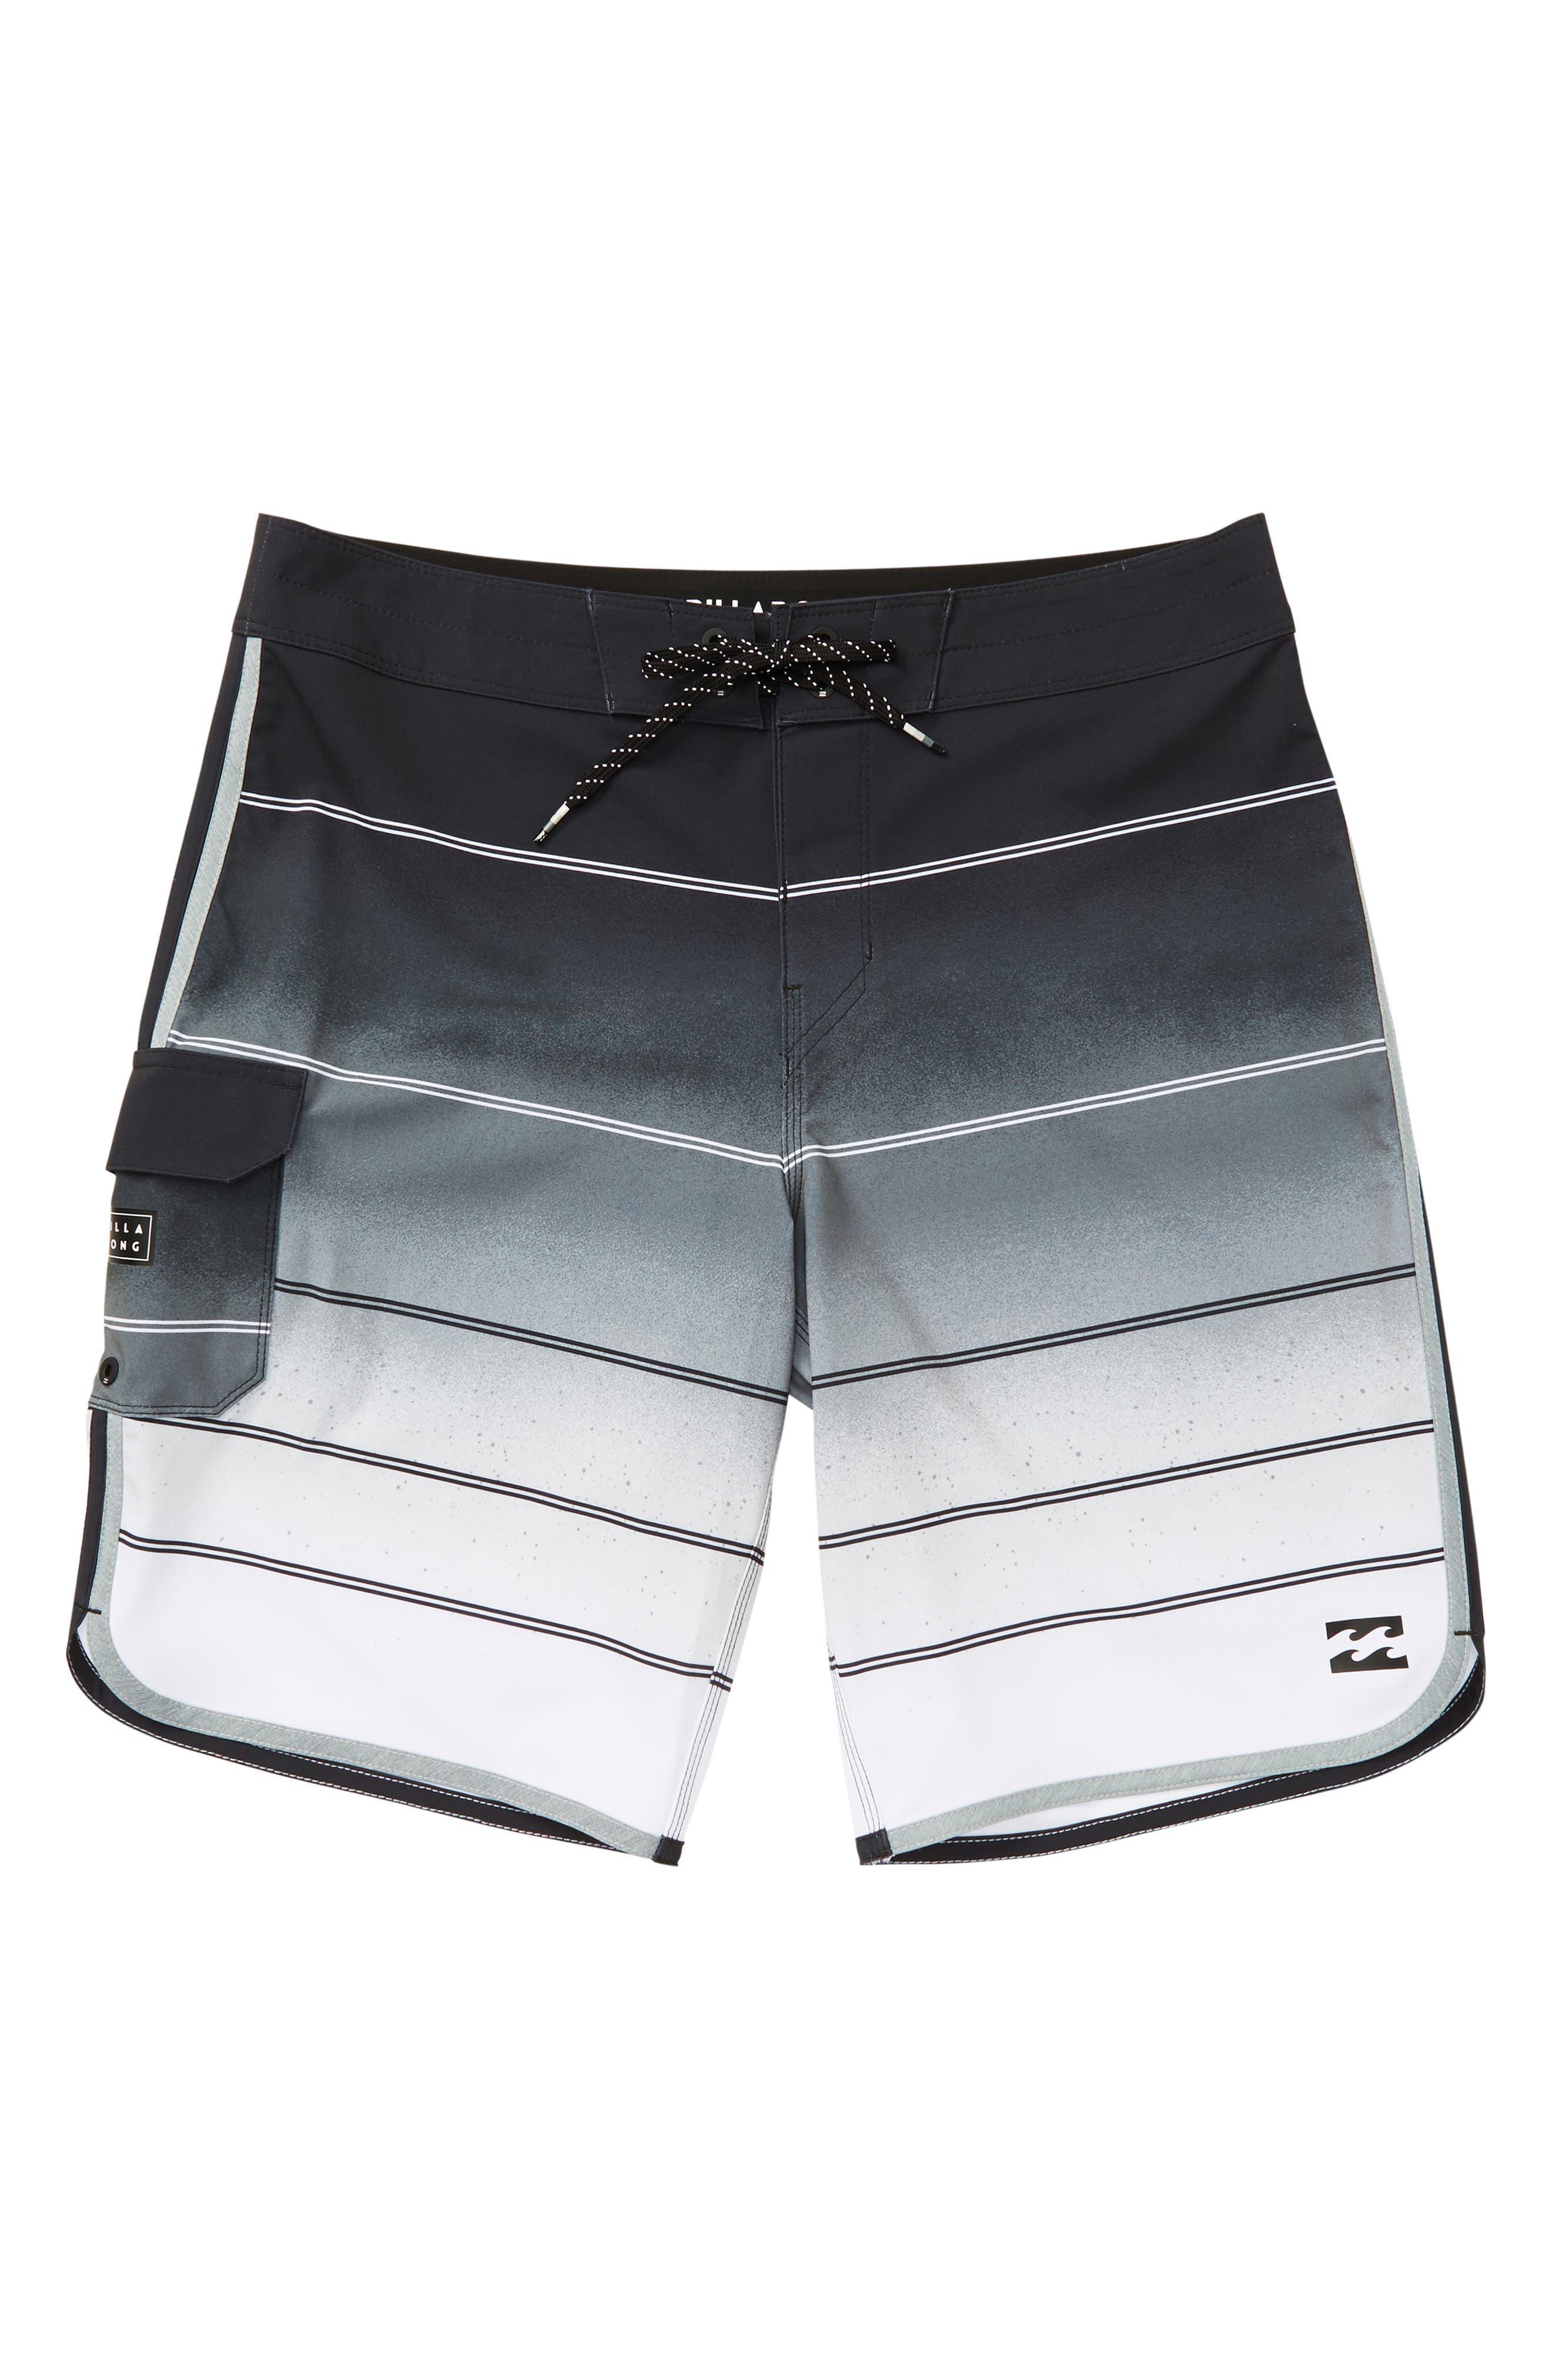 73 X Stripe Board Shorts,                             Main thumbnail 1, color,                             020